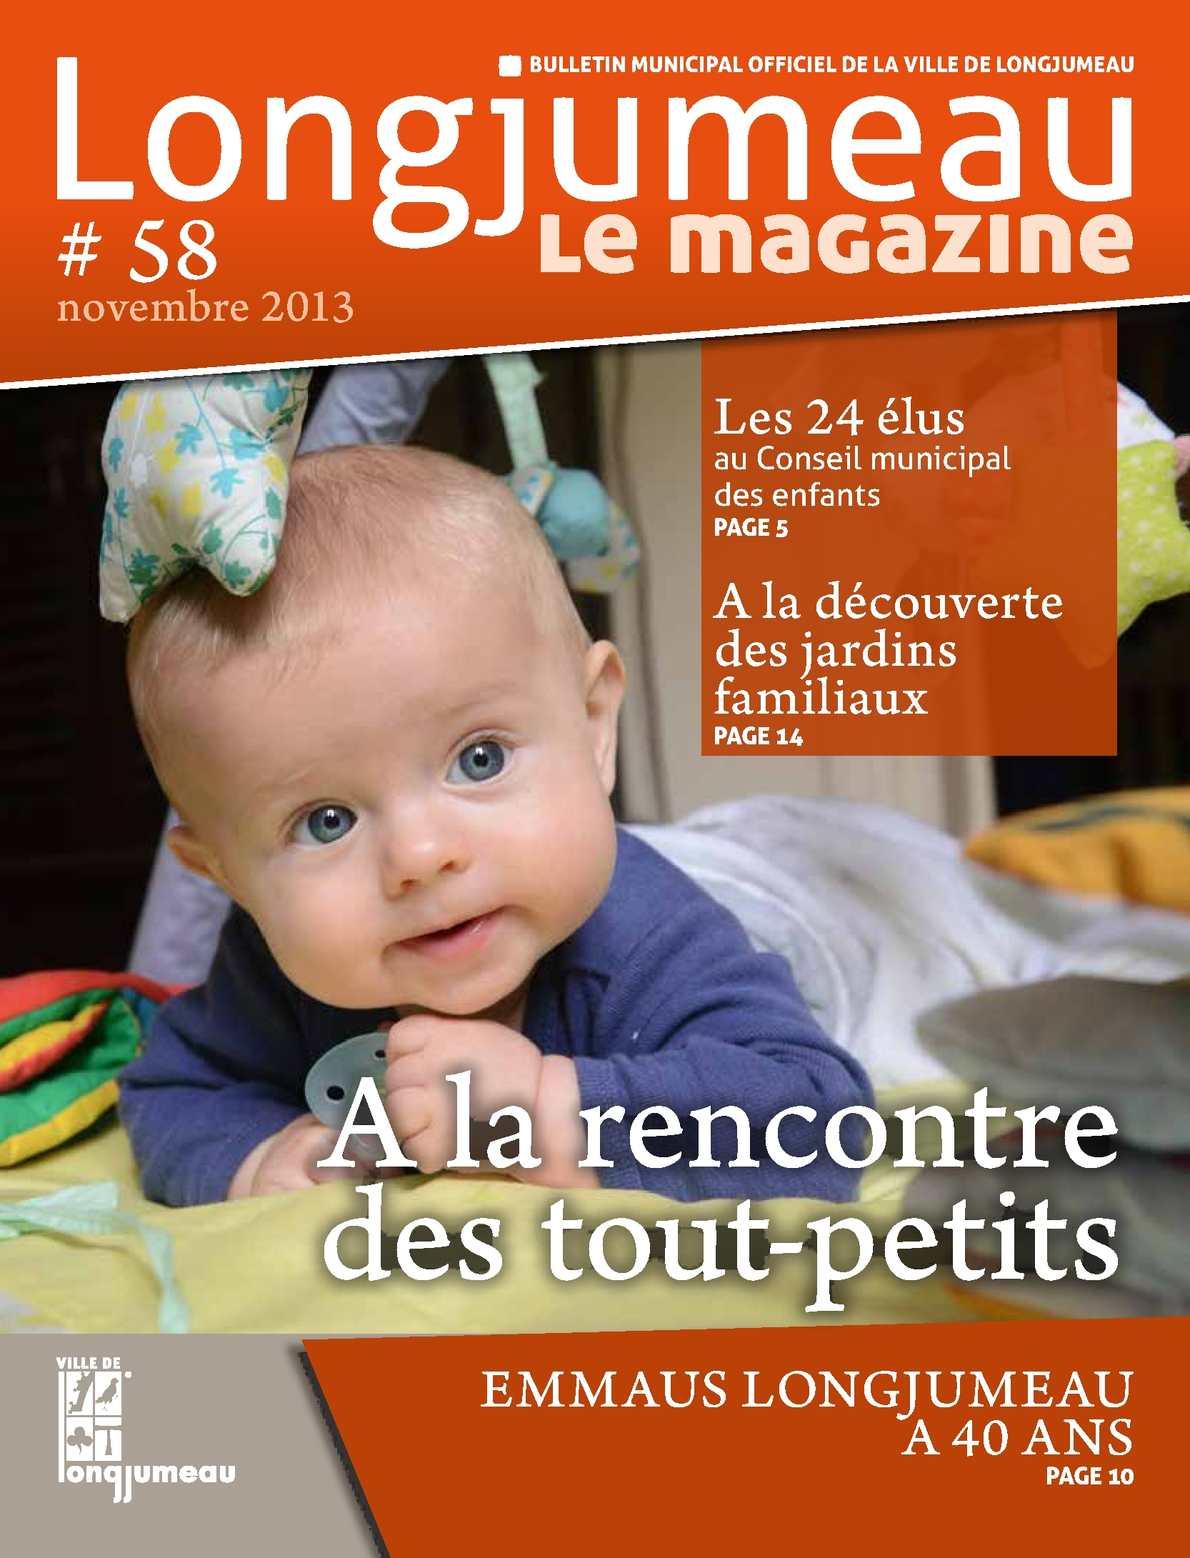 Calaméo Longjumeau Le Magazine 58 Novembre 2013